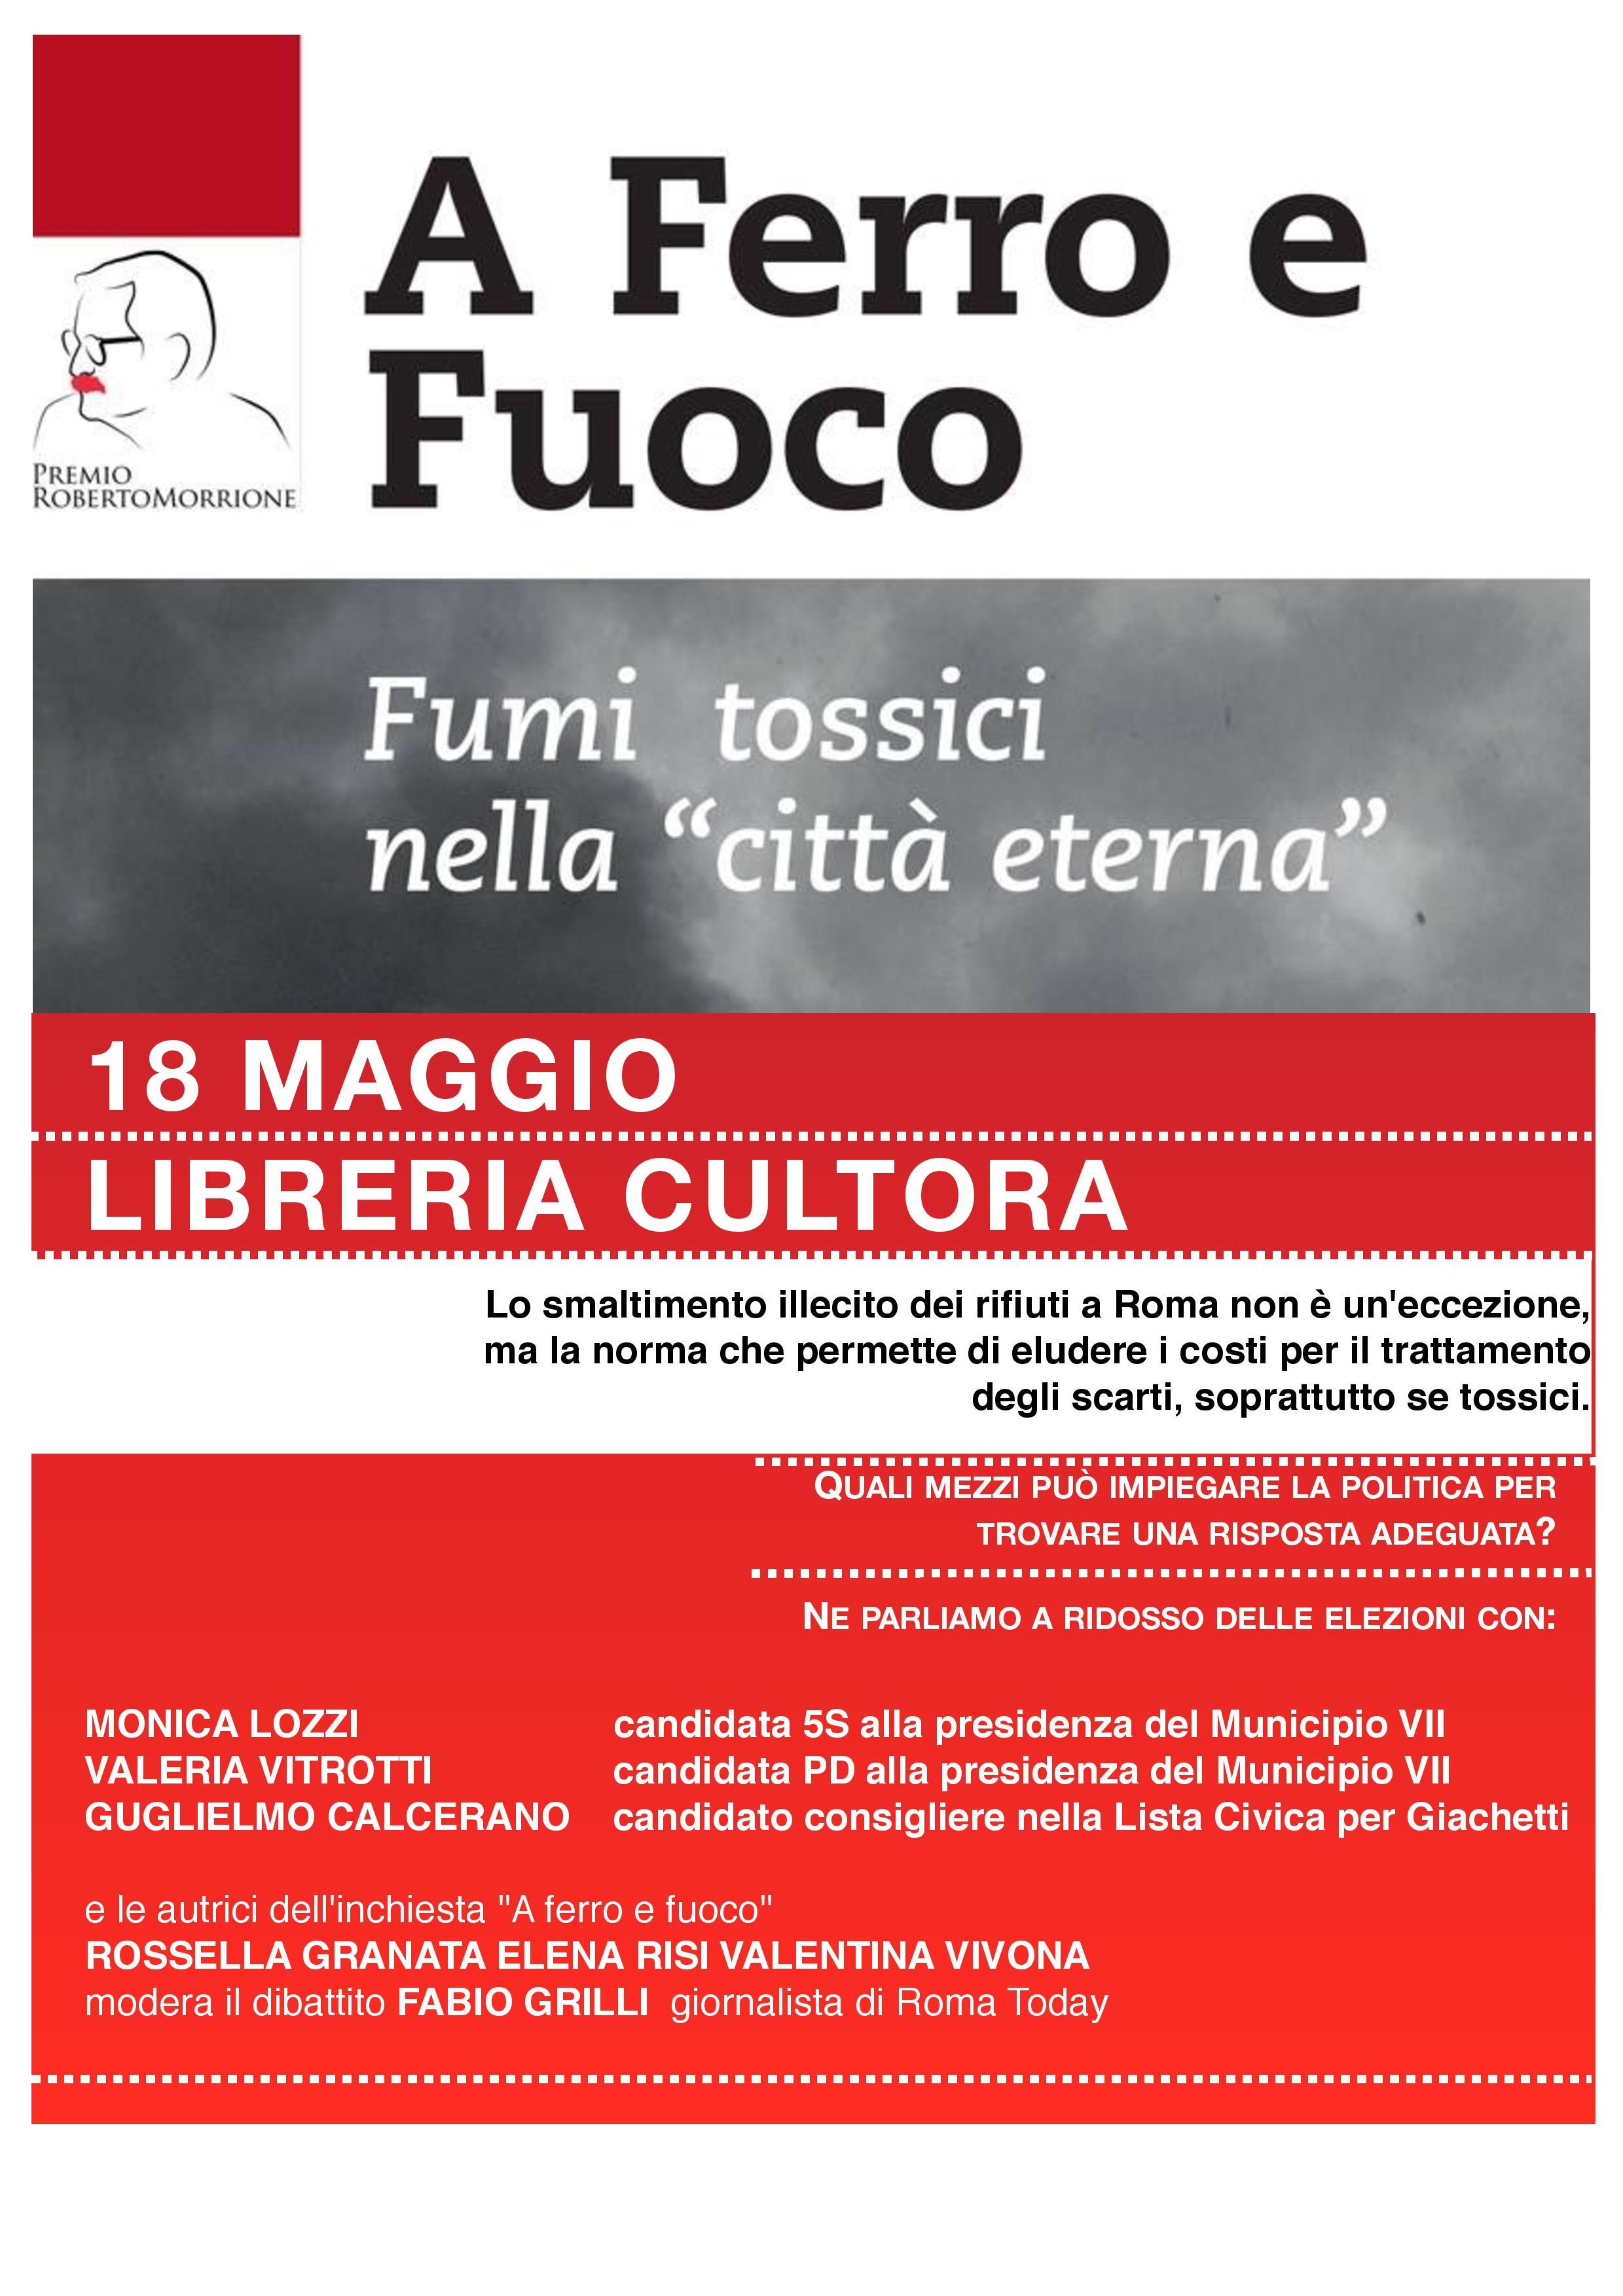 locandina cultora-page-001